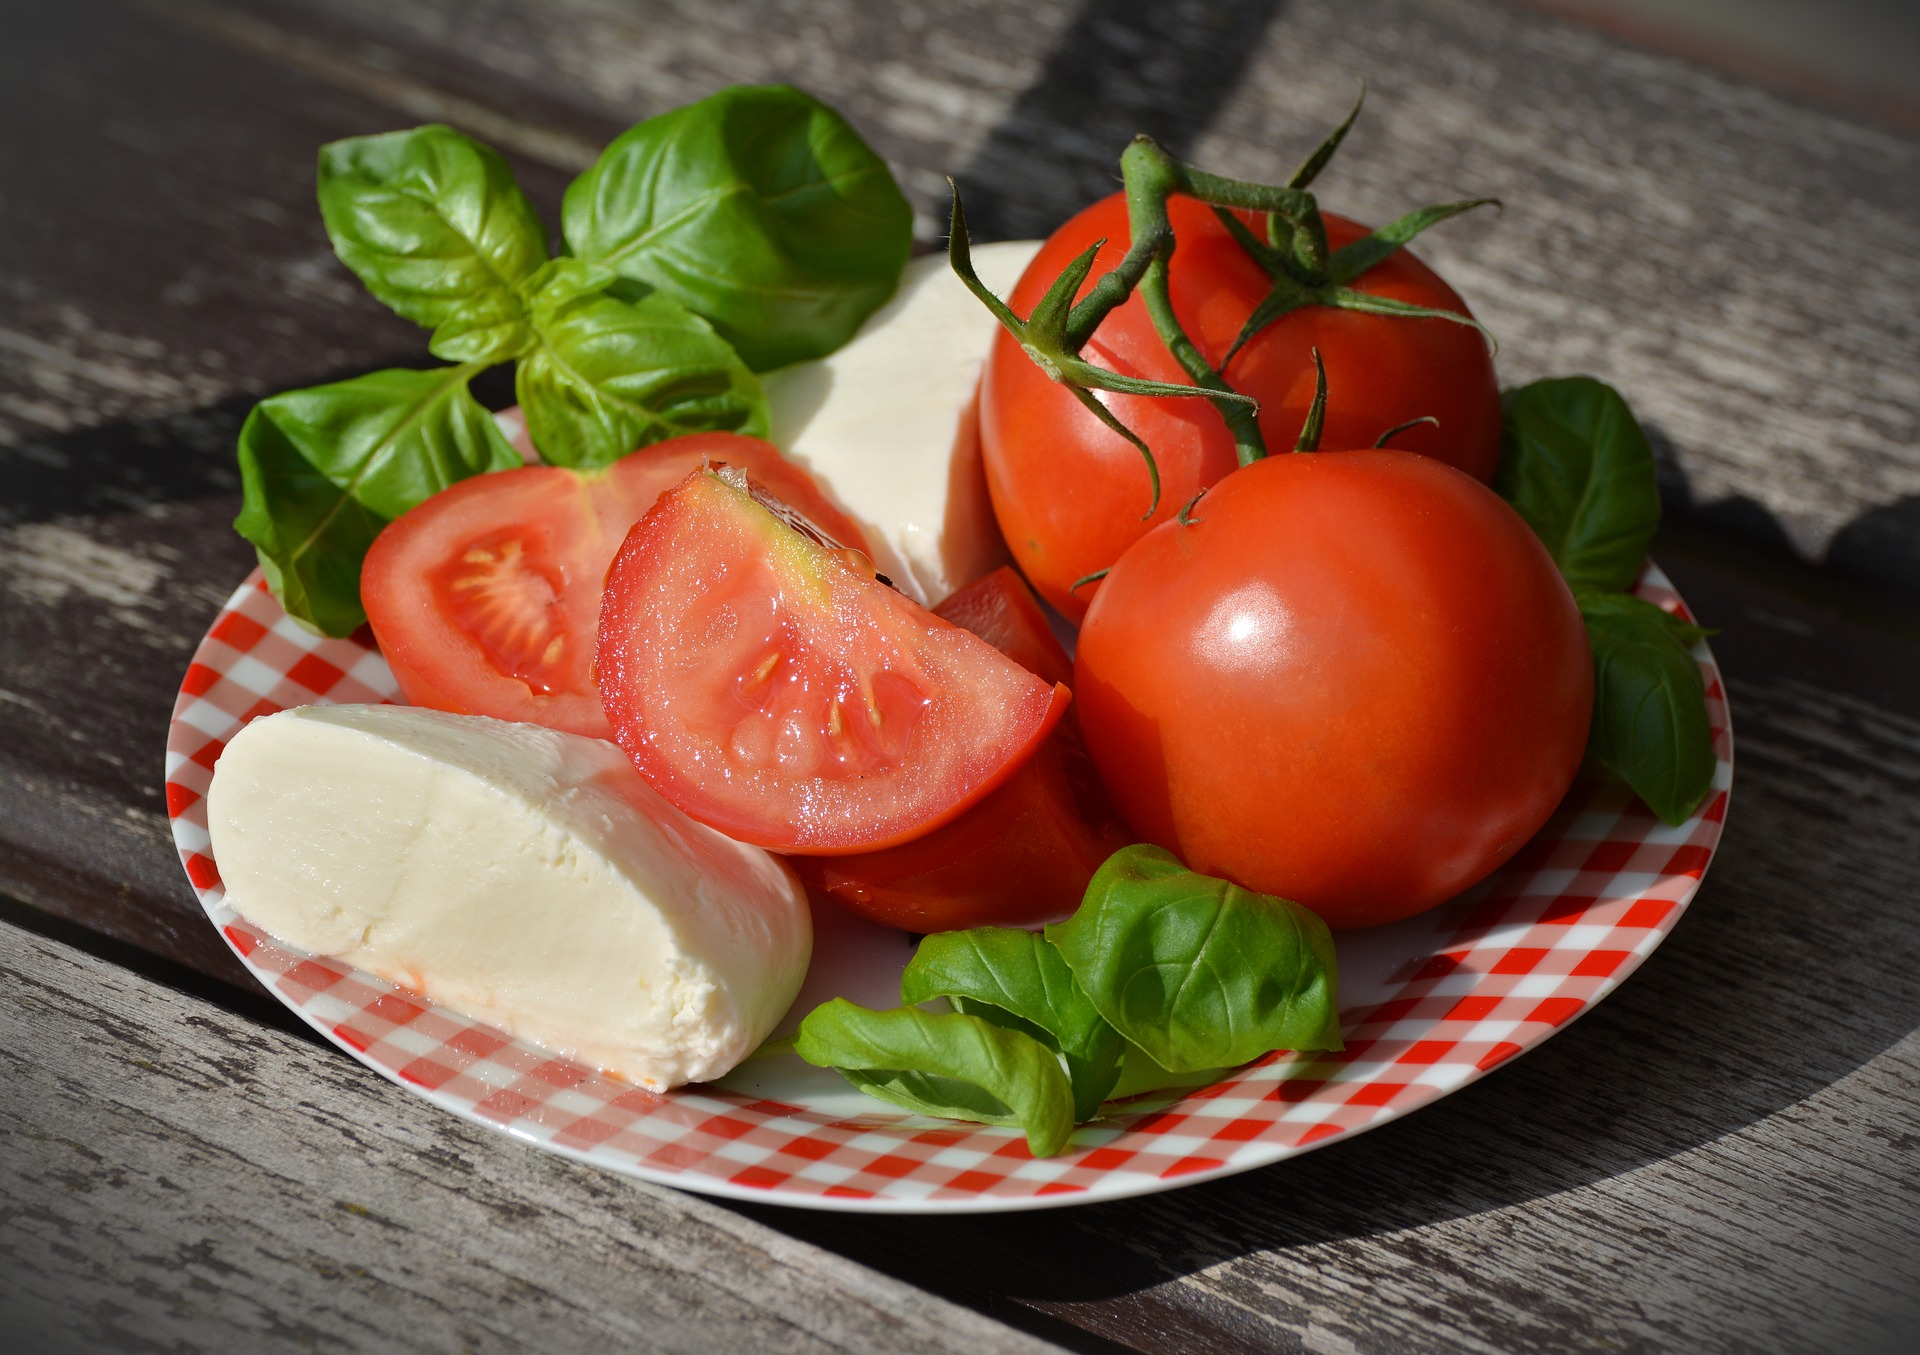 Tomaten im Garten anpflanzen Desmondo